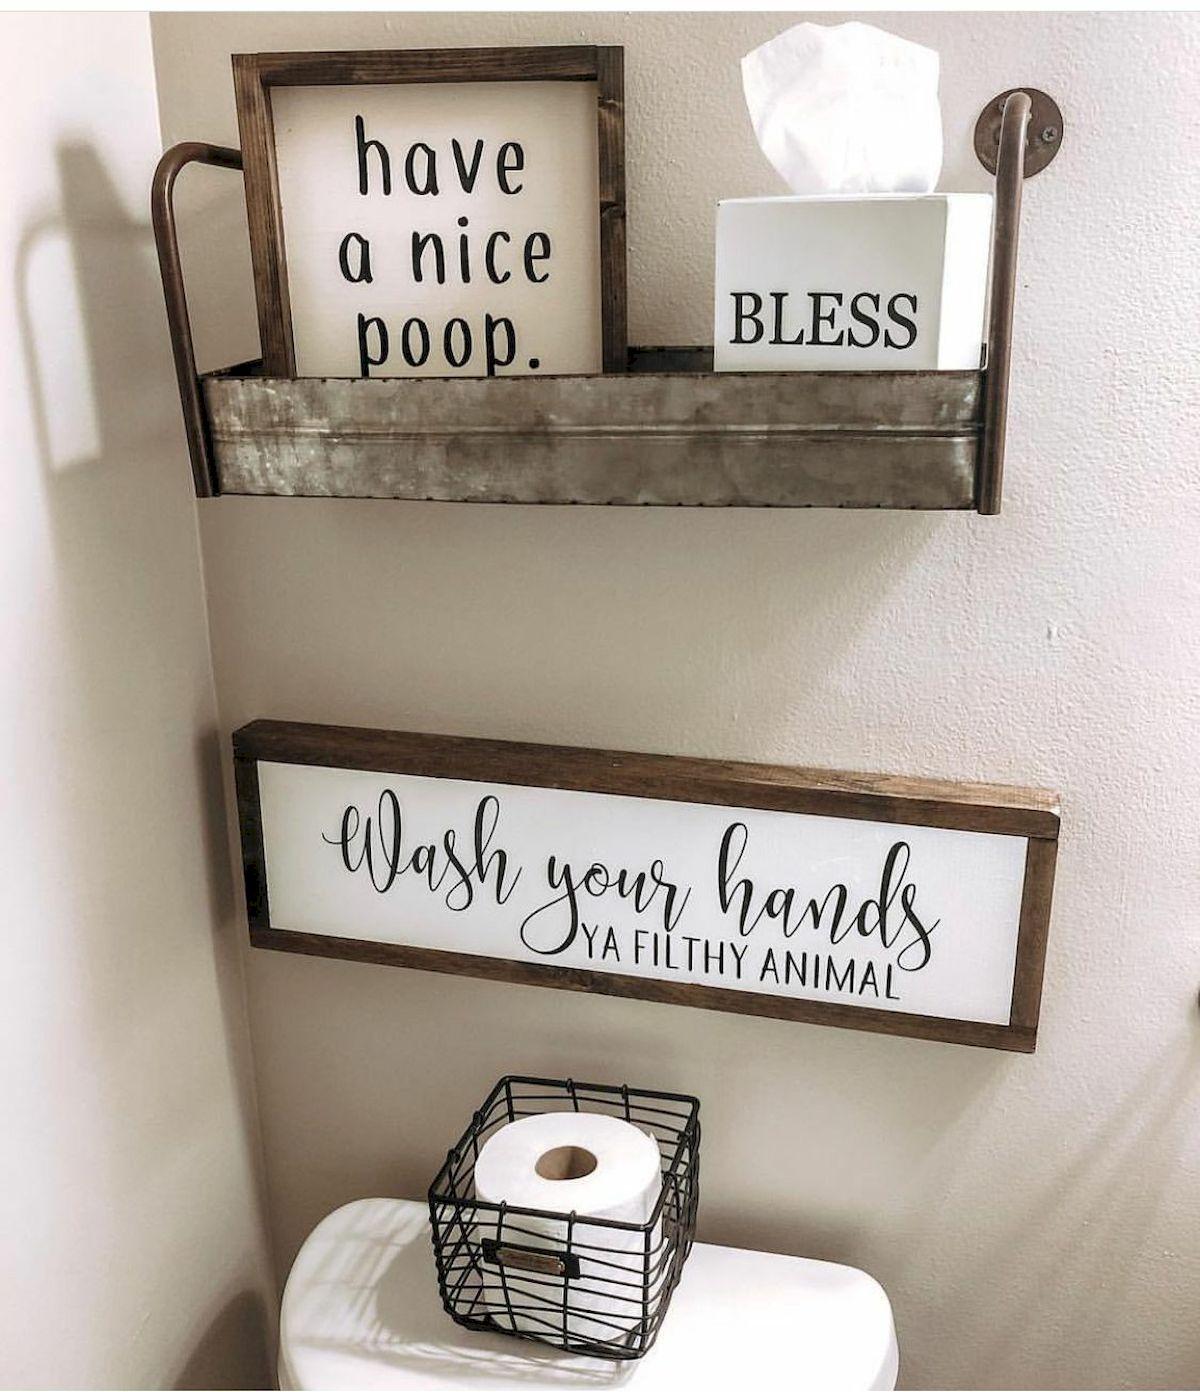 60+ Awesome Bathroom Decor and Design Ideas (33)